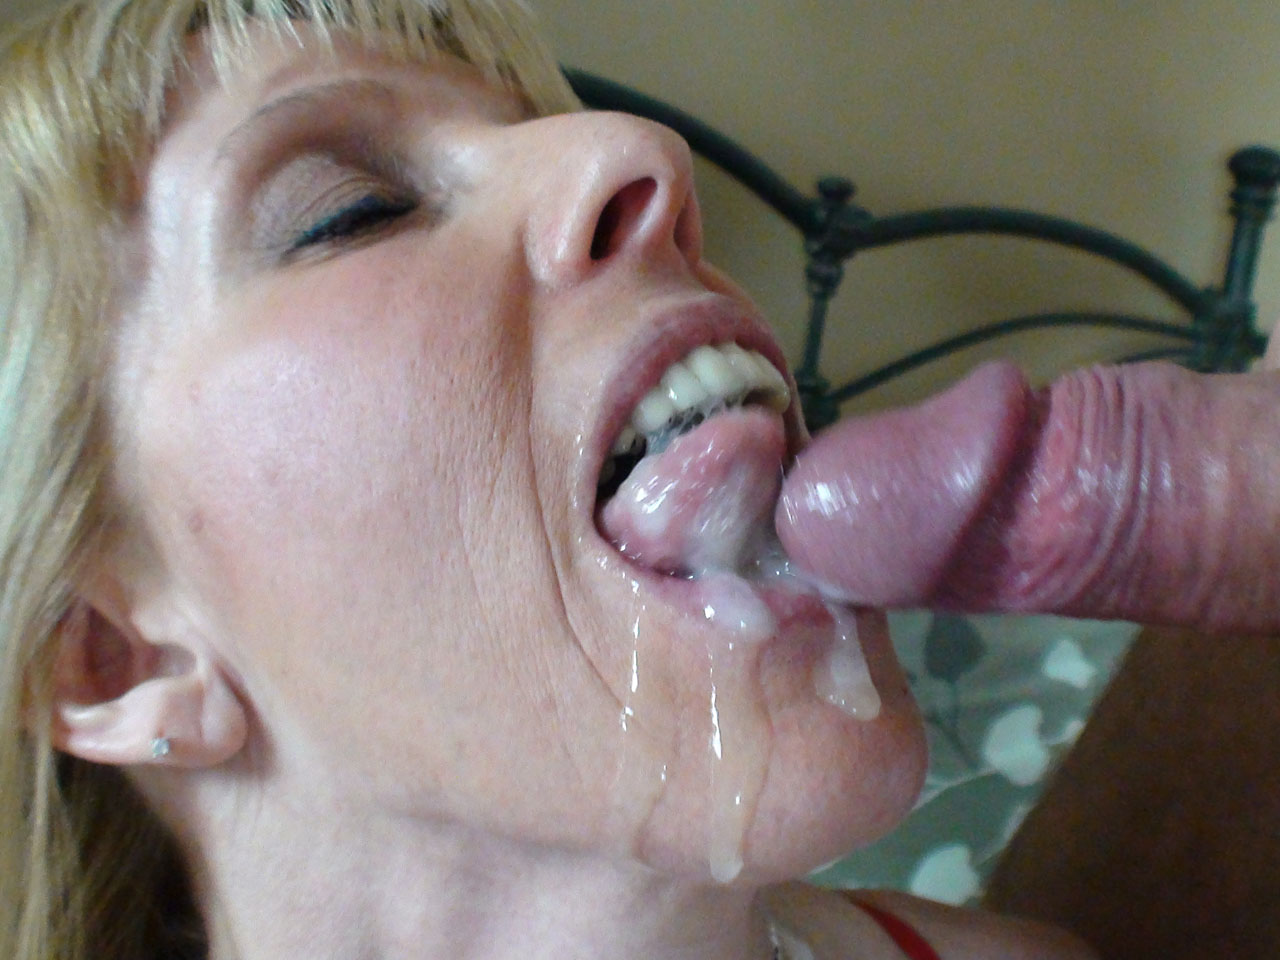 Carol cox fun fan facial - 2 part 3